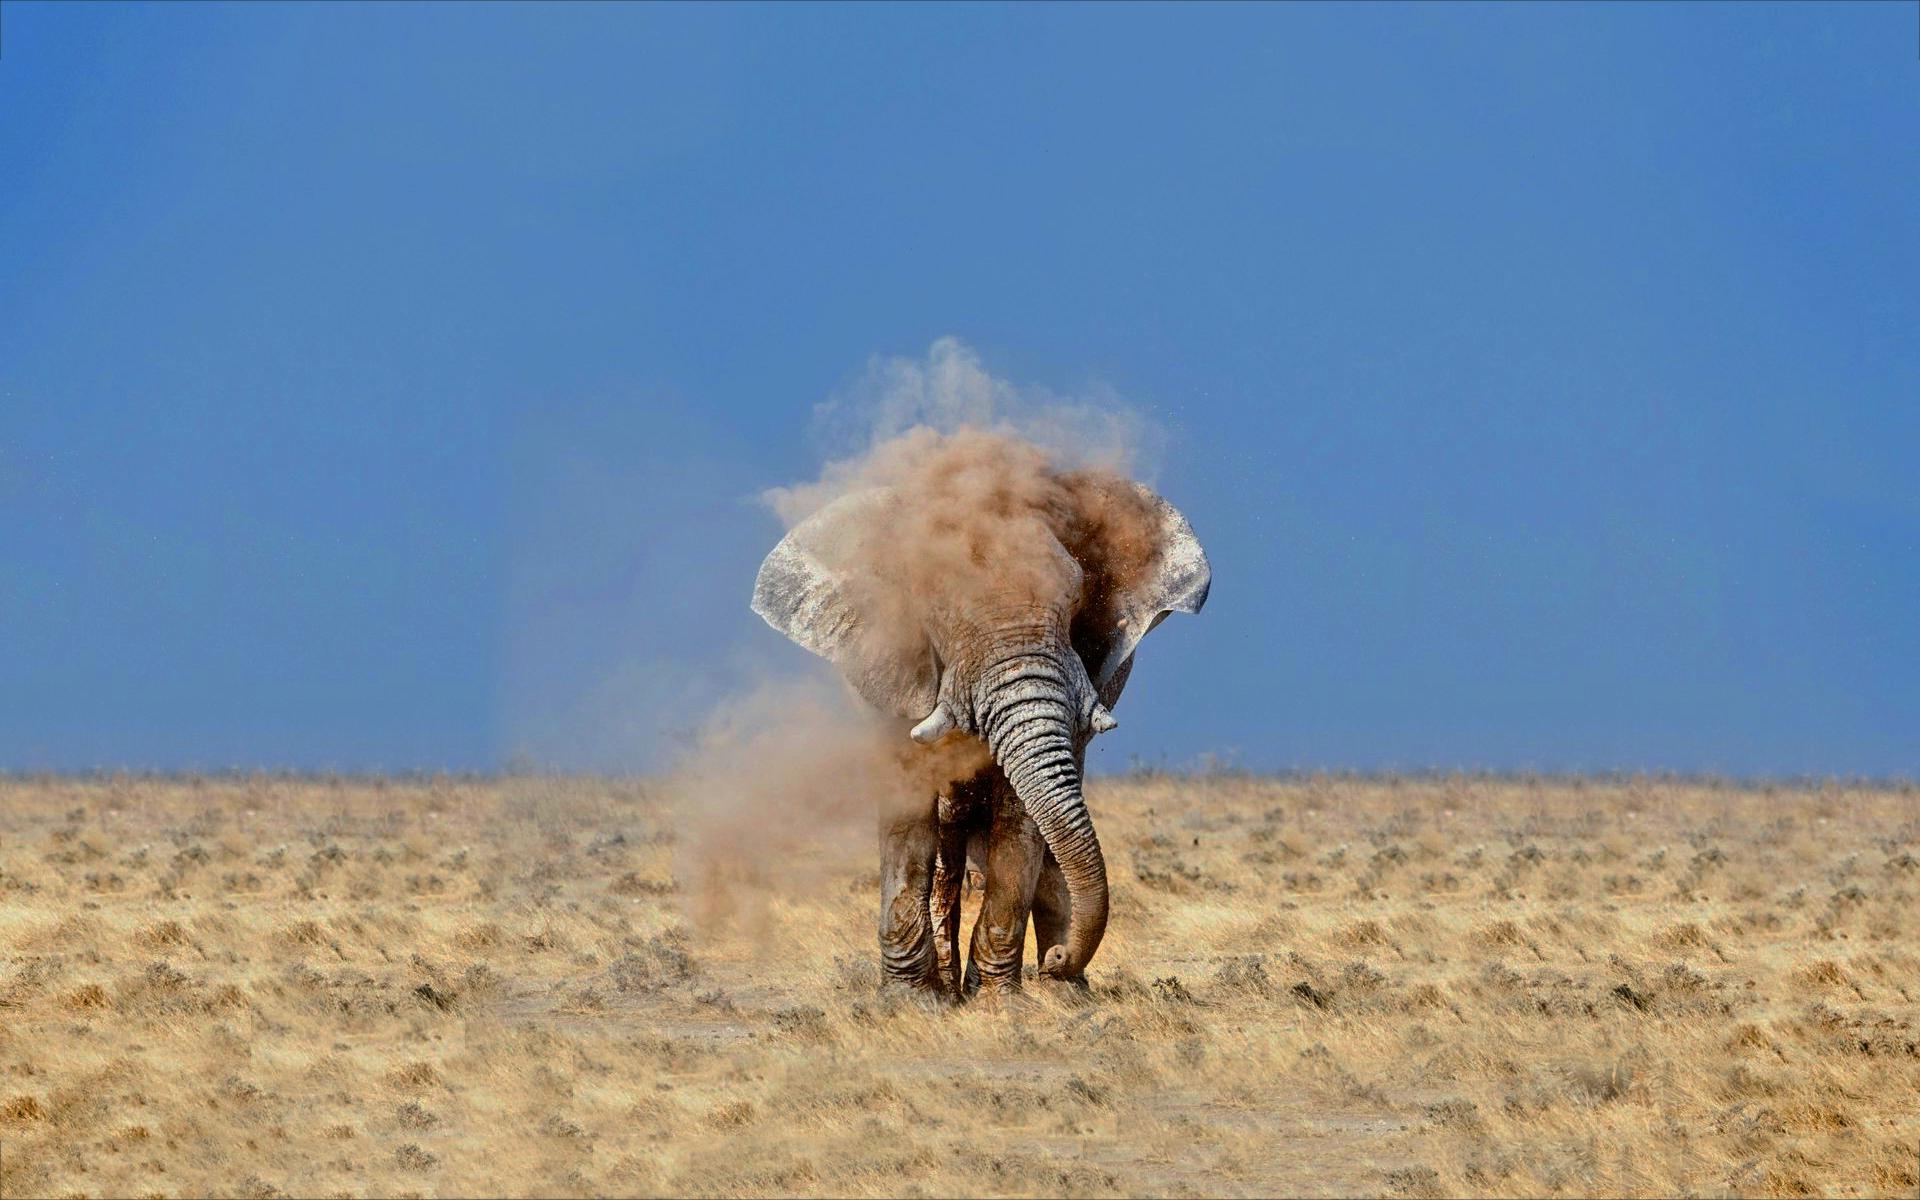 hd wallpaper elephant